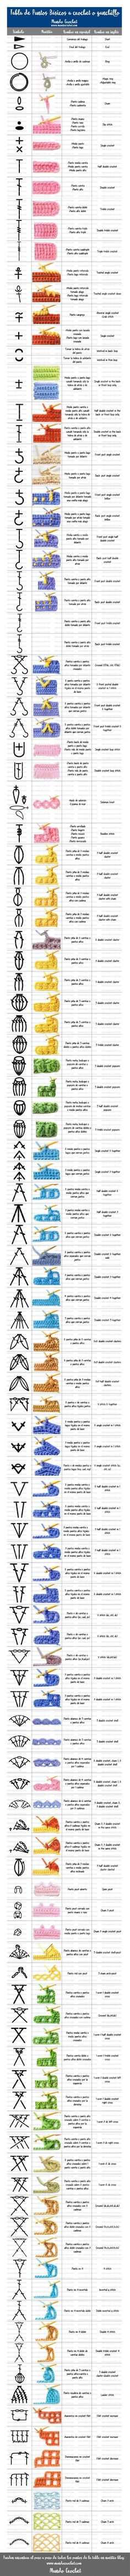 Crochet Bookmark Pattern, Crochet Bookmarks, Crochet Diagram, Basic Crochet Stitches, Crochet Chart, Crochet Basics, Diy Crochet, Crochet Patterns, Learn Crochet